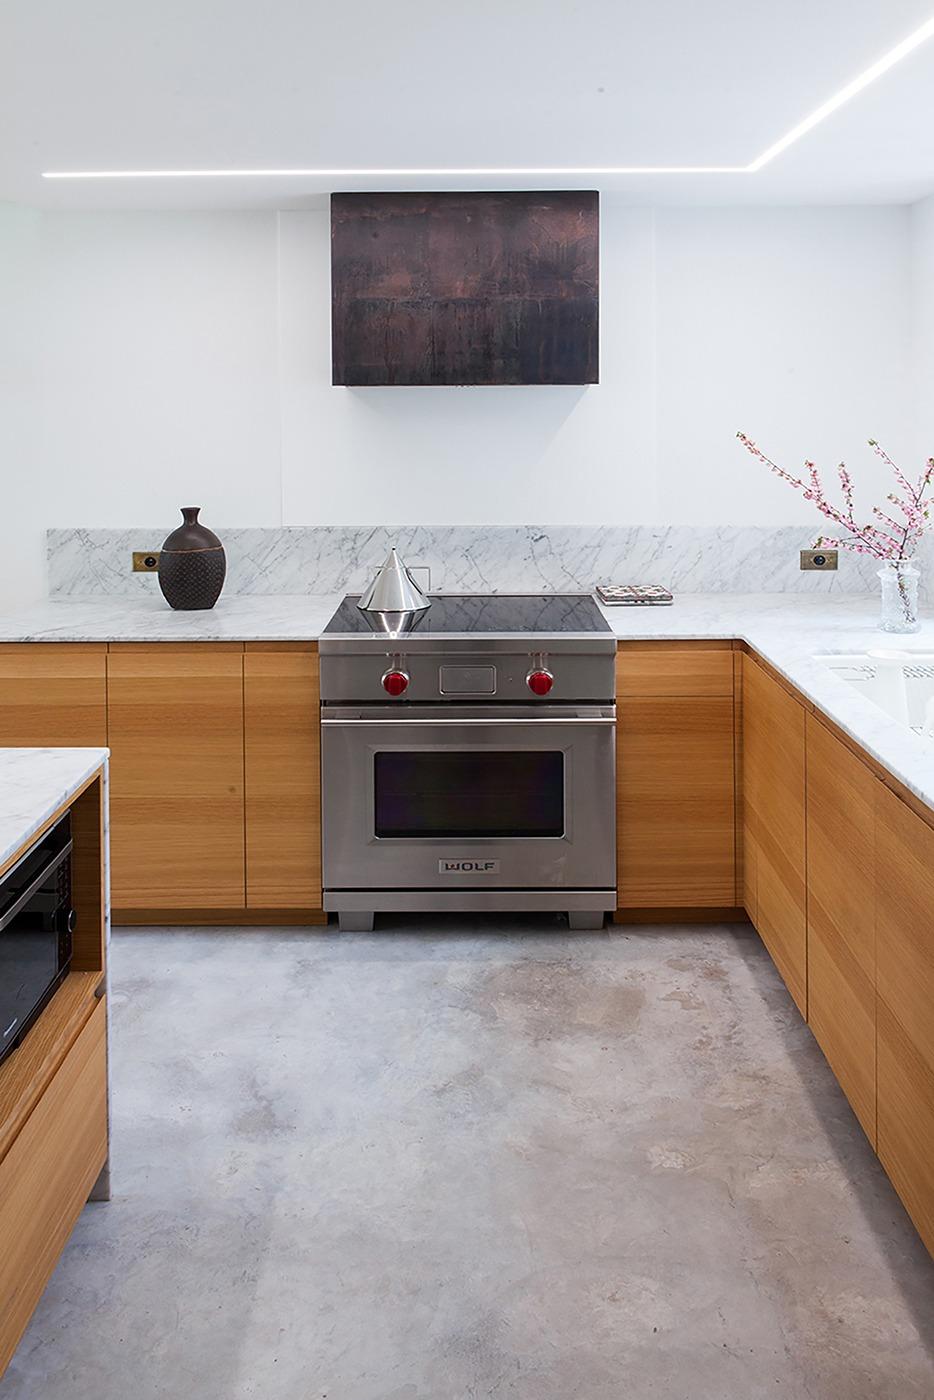 Design-Built Kitchen Renovation